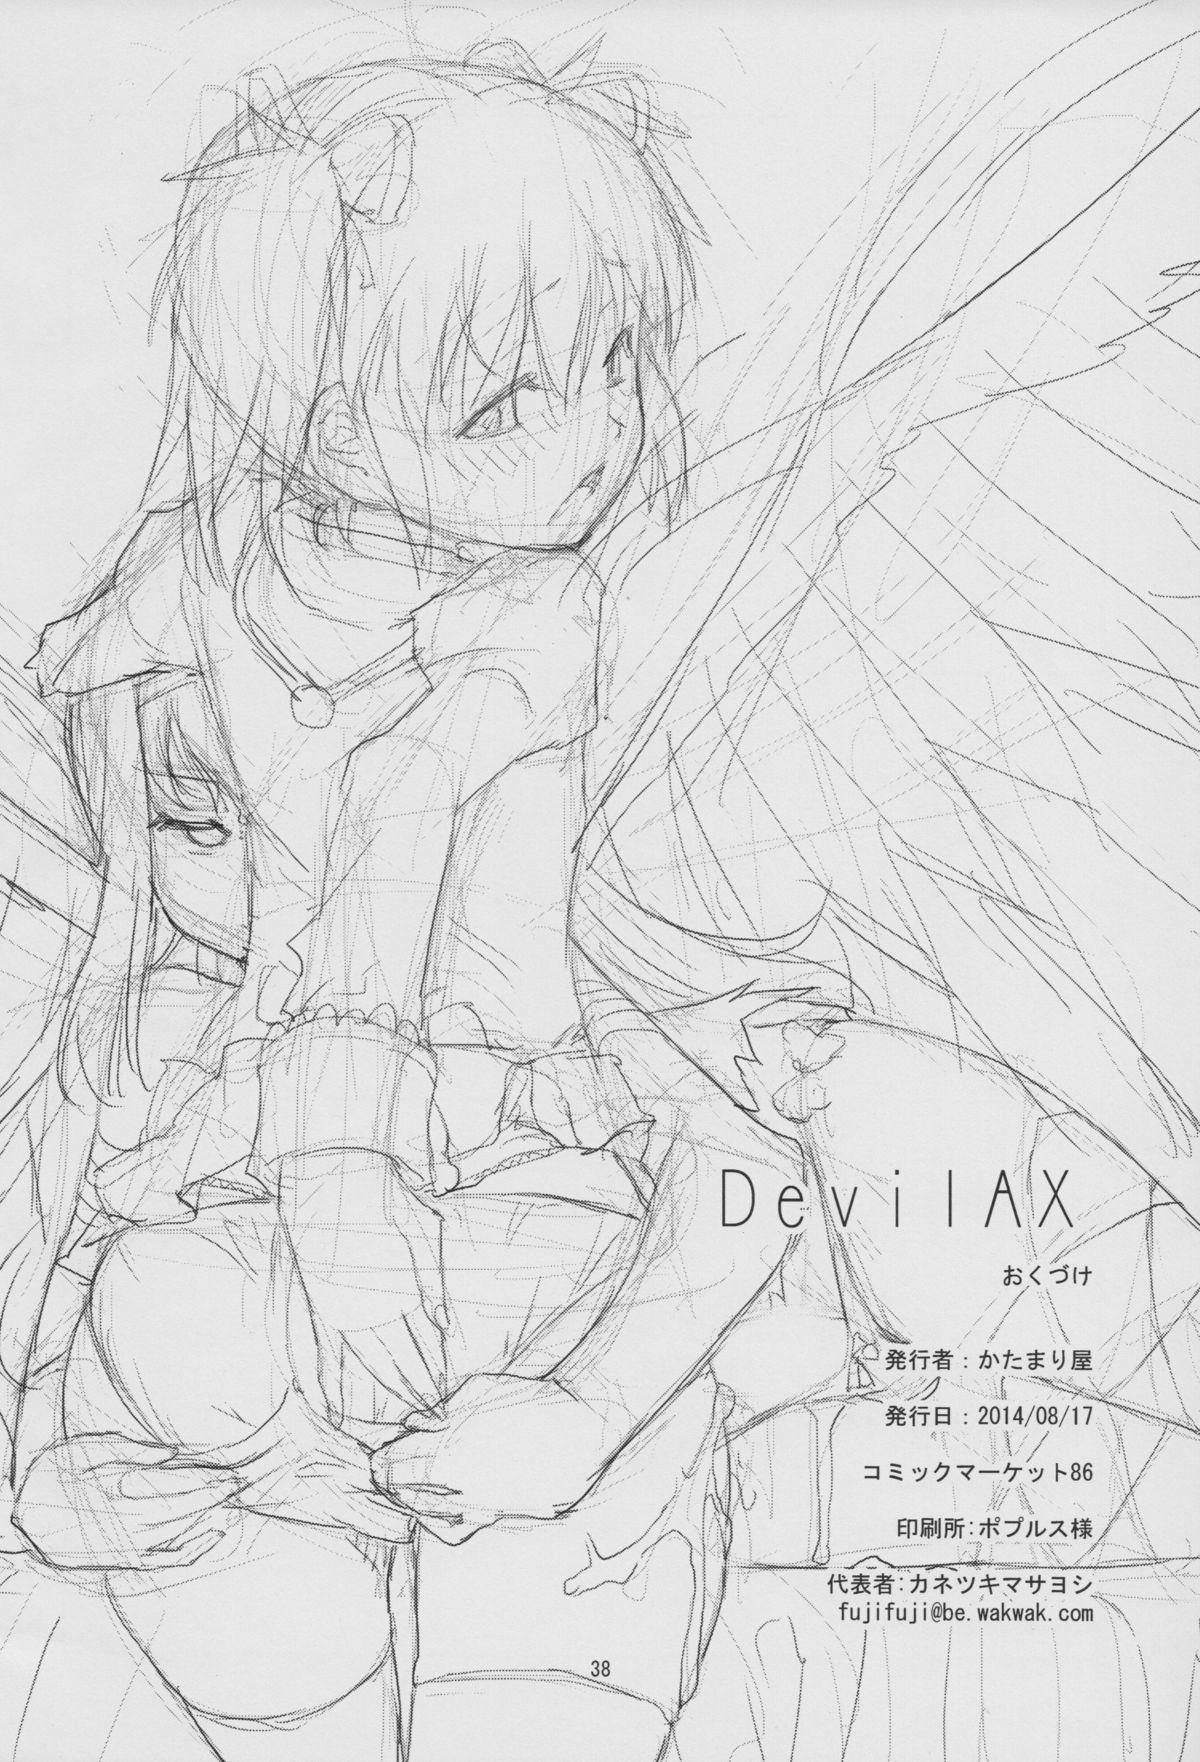 (C86) [KATAMARI-YA (Kanetsuki Masayoshi, Shinama) DevilAX (Puella Magi Madoka Magica) 29